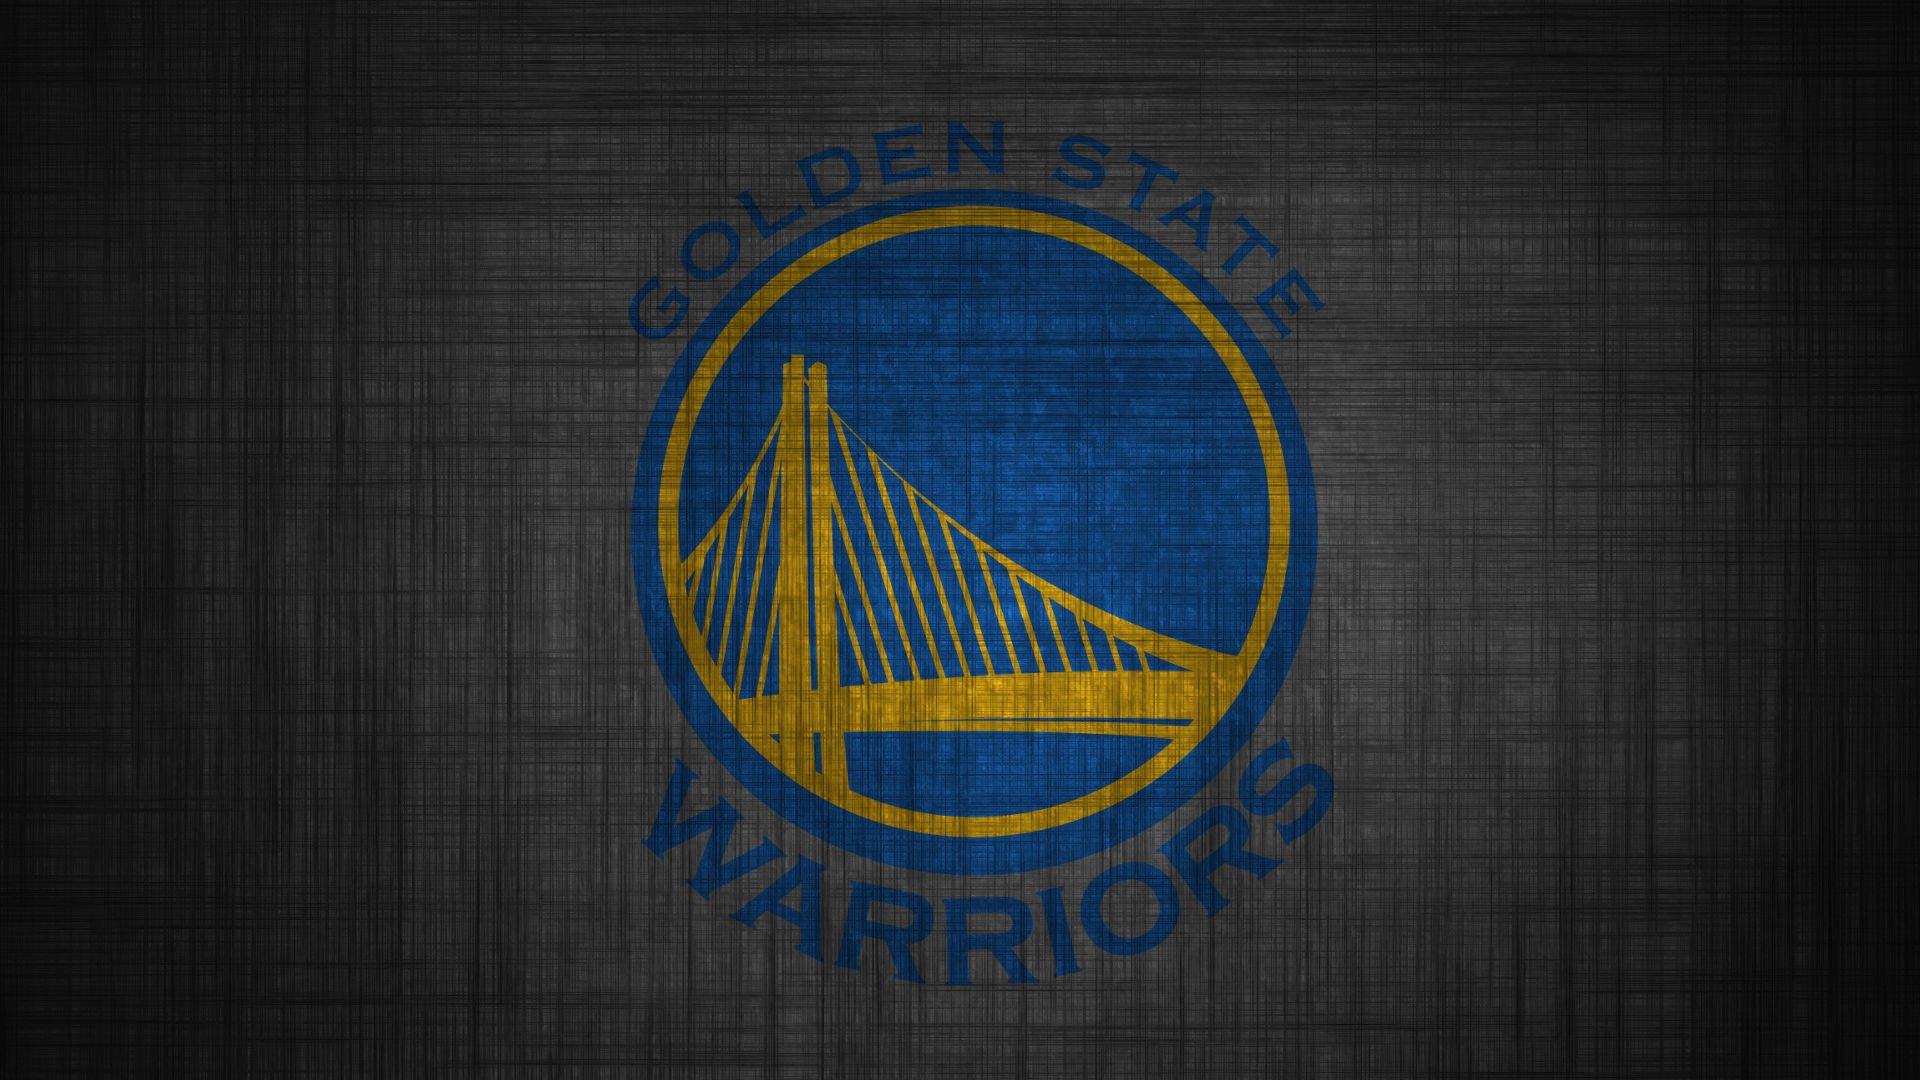 Free Download Best Golden State Warriors Nba Wallpaper 2018 Live